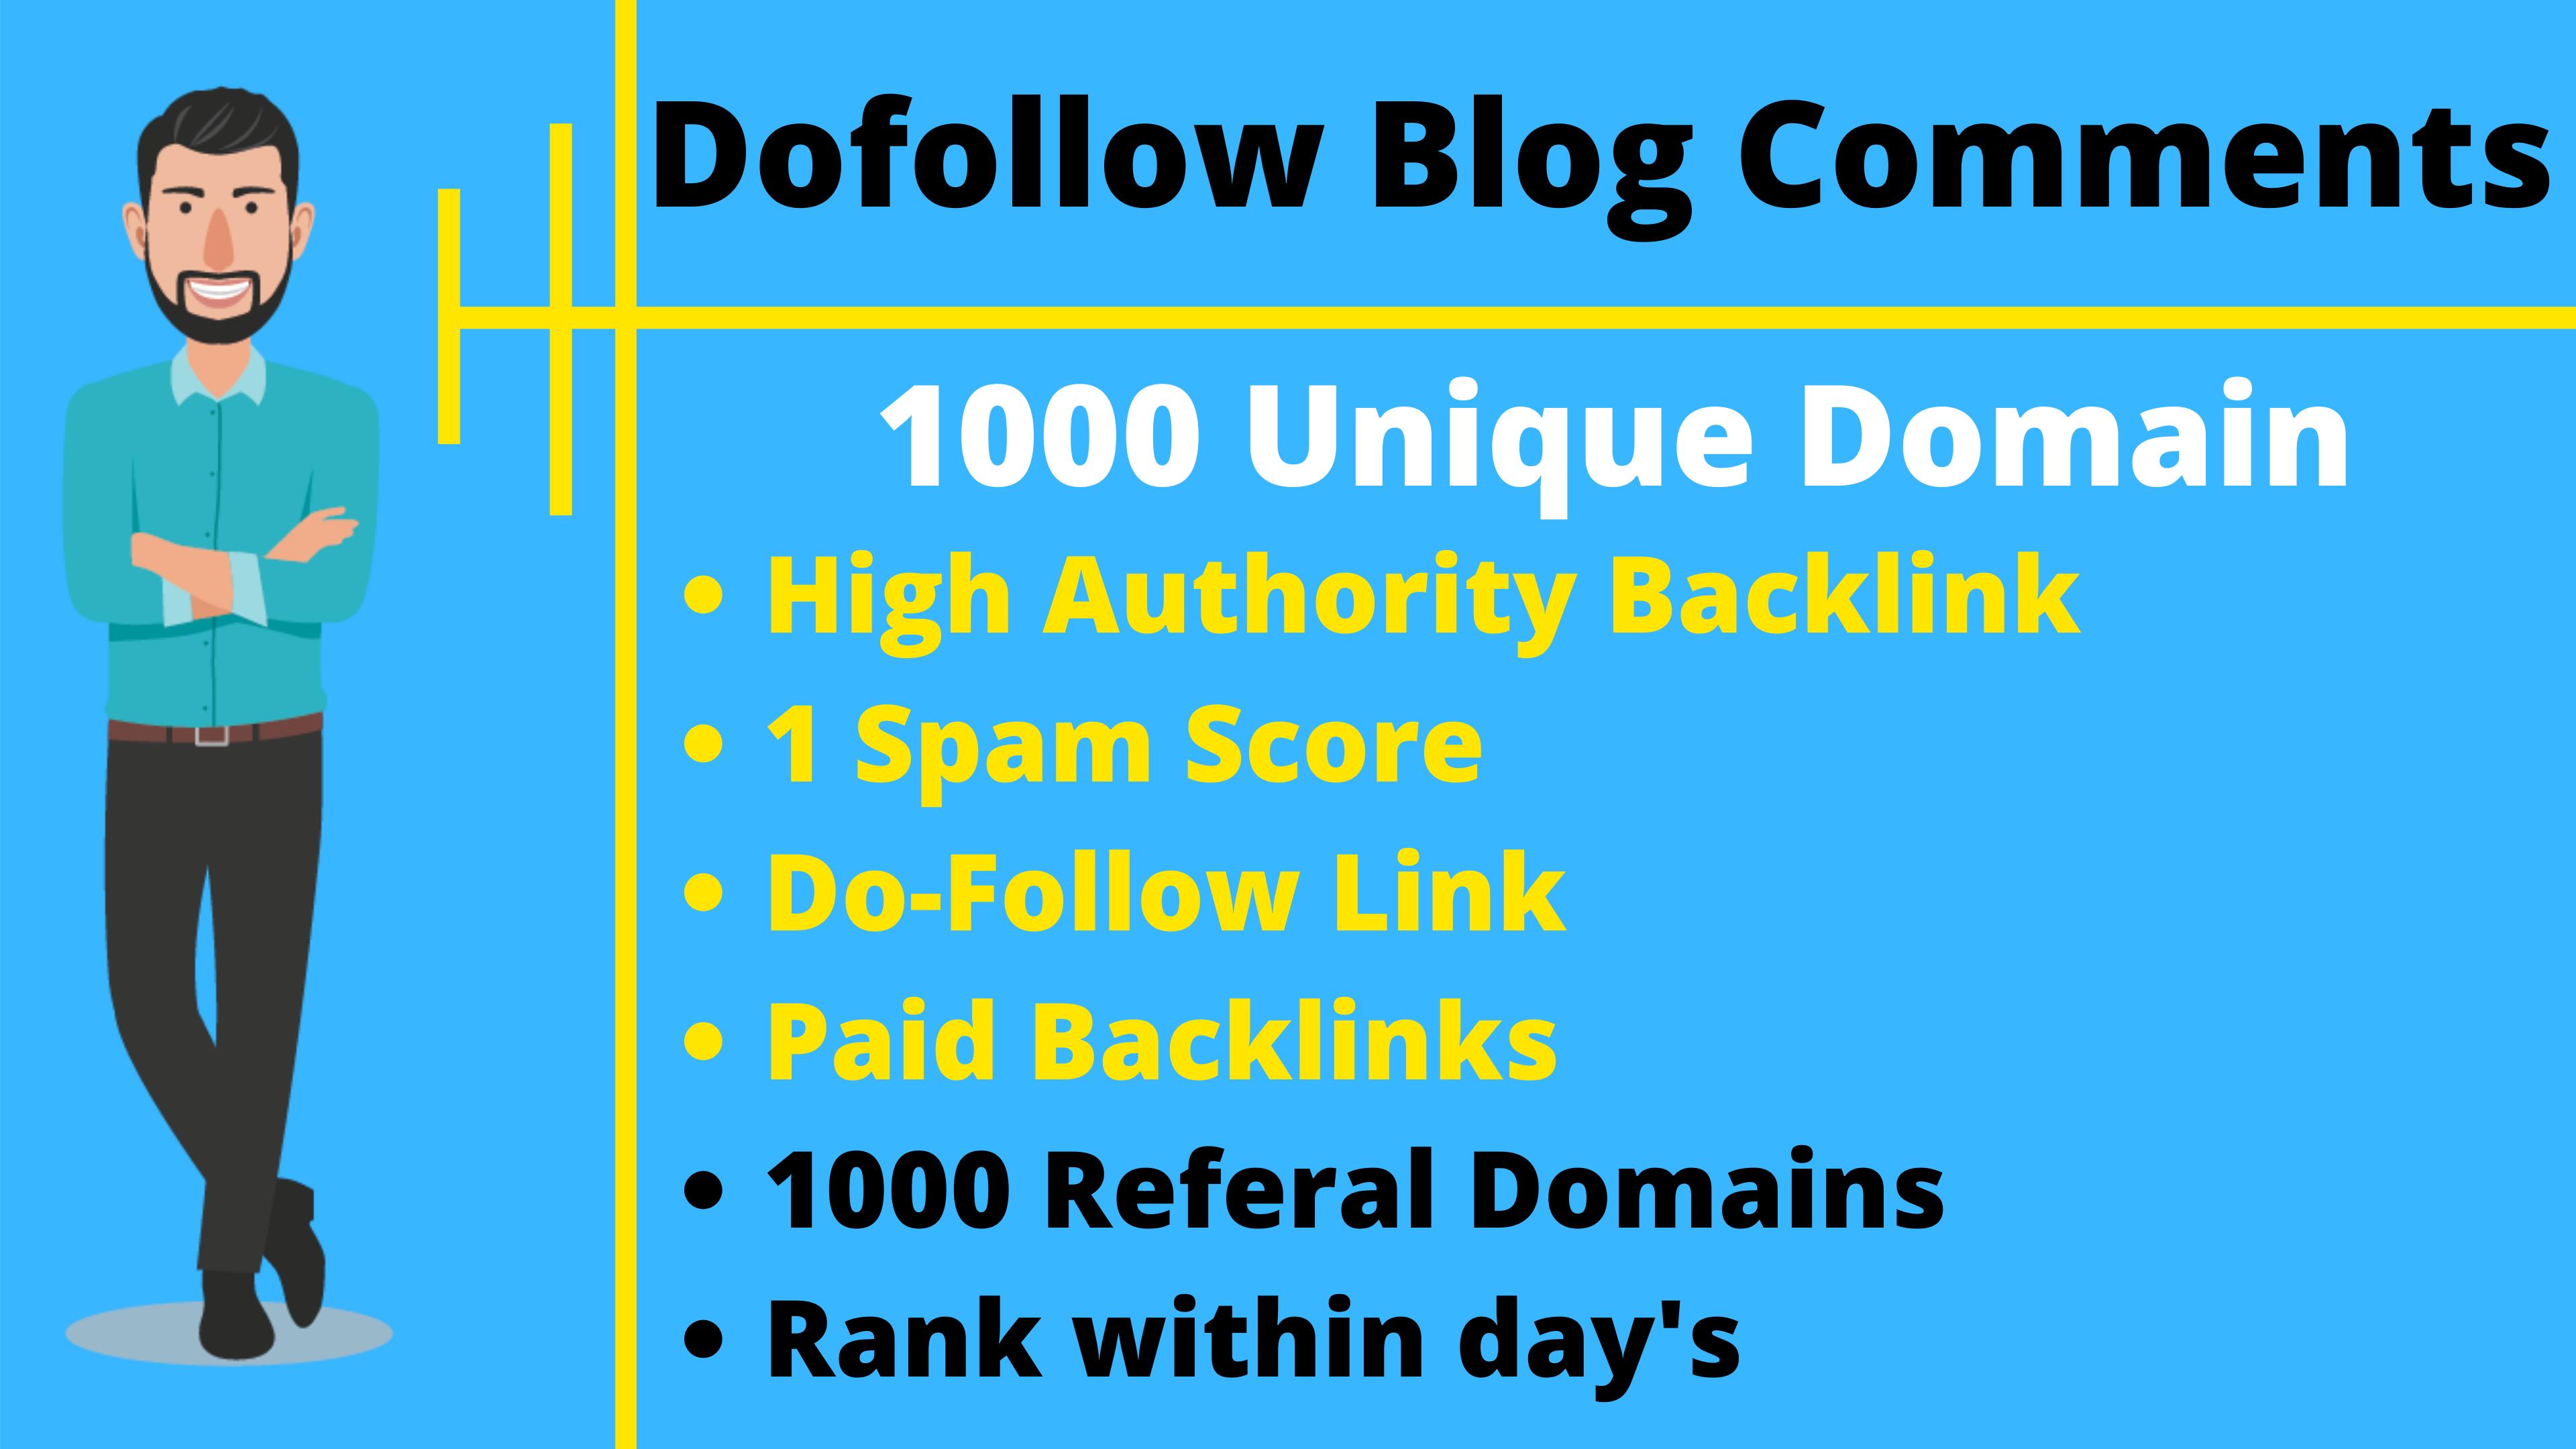 Manually create 1000 Unique Domain dofollow blog comments SEO backlinks